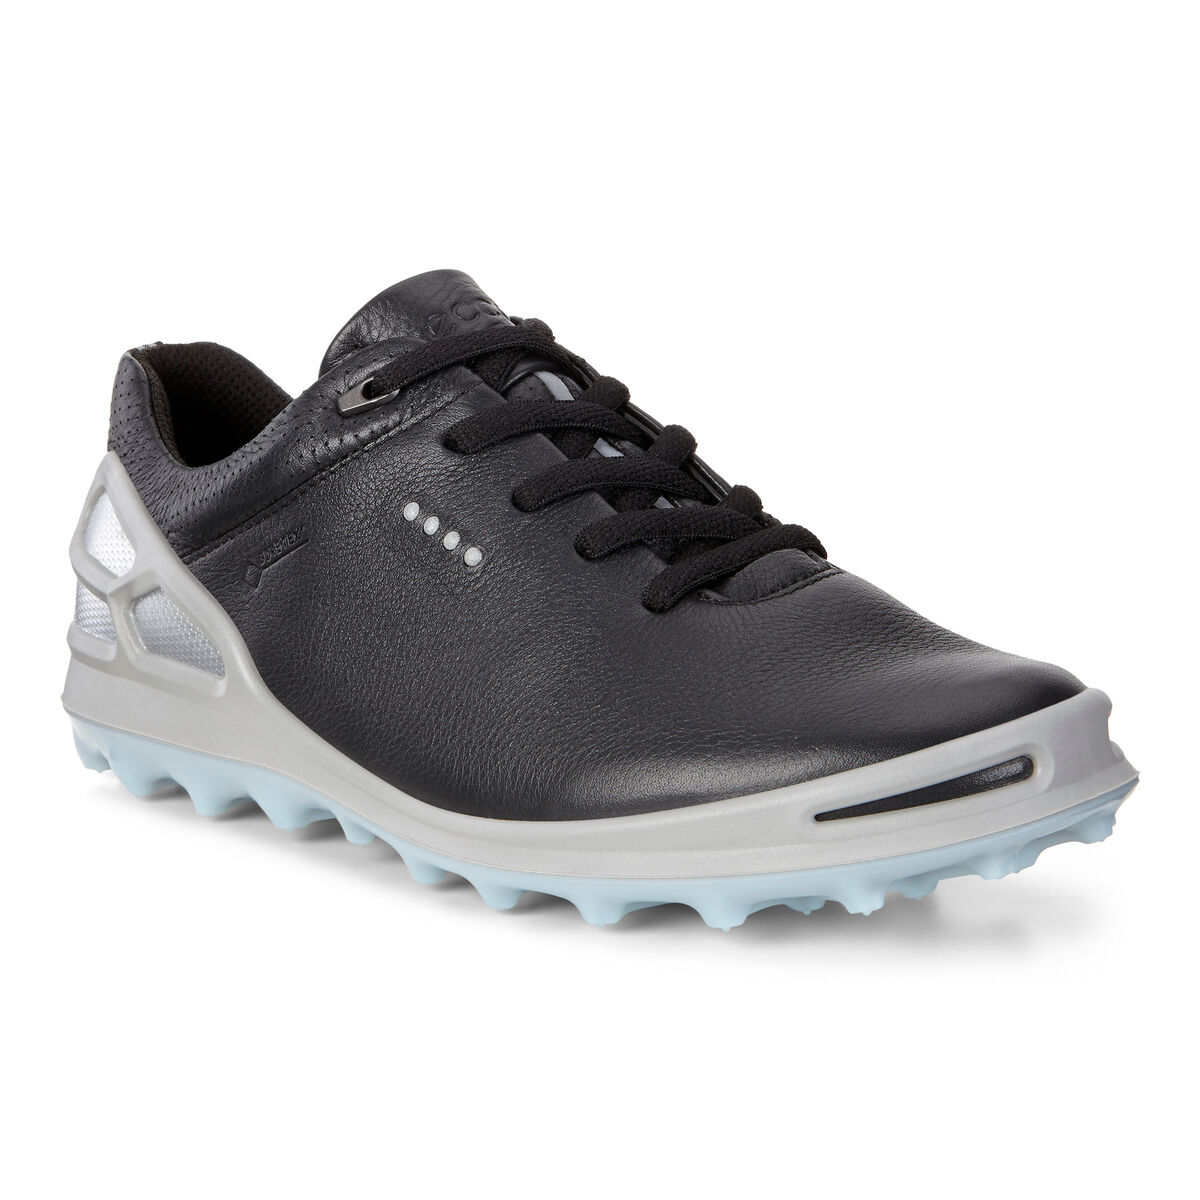 946470a530ed ECCO Cage Pro GTX Women s Golf Shoe - Black Silver